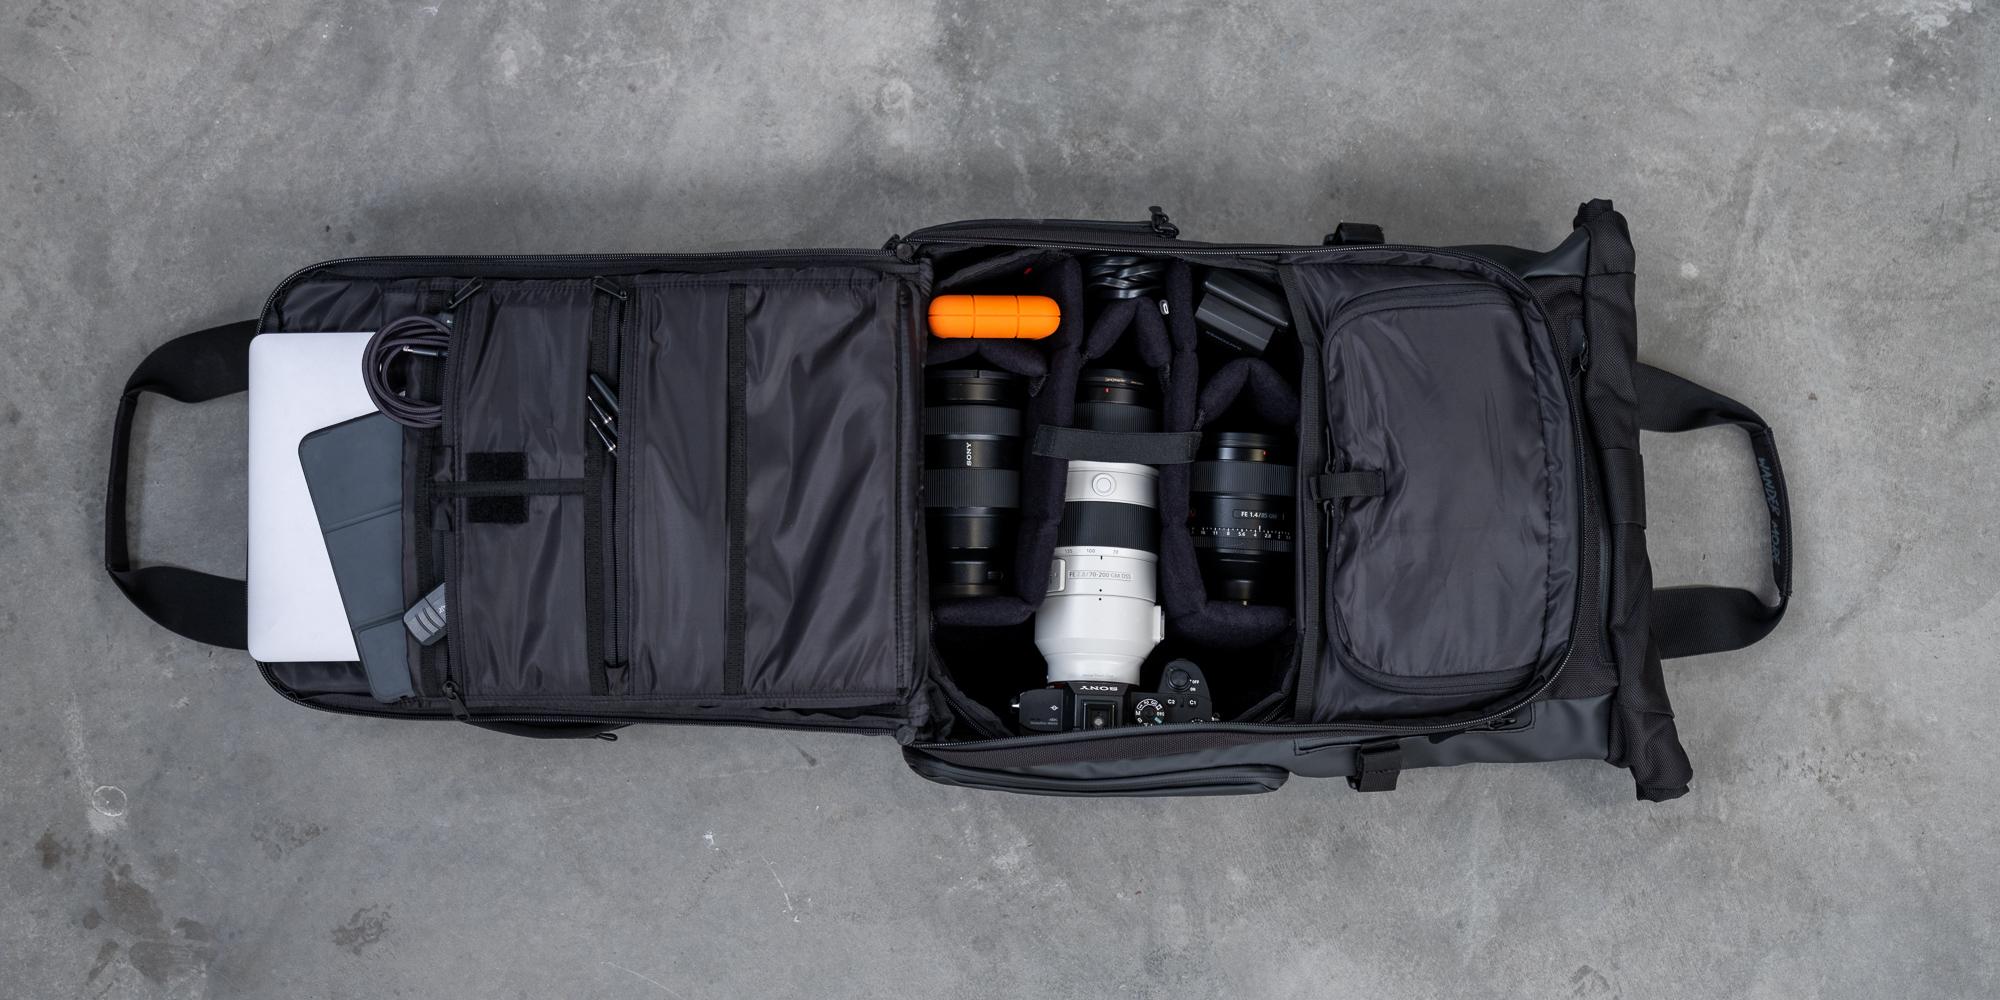 Wandrd All-new Prvke 21 Backpack - A Photographer's Essential